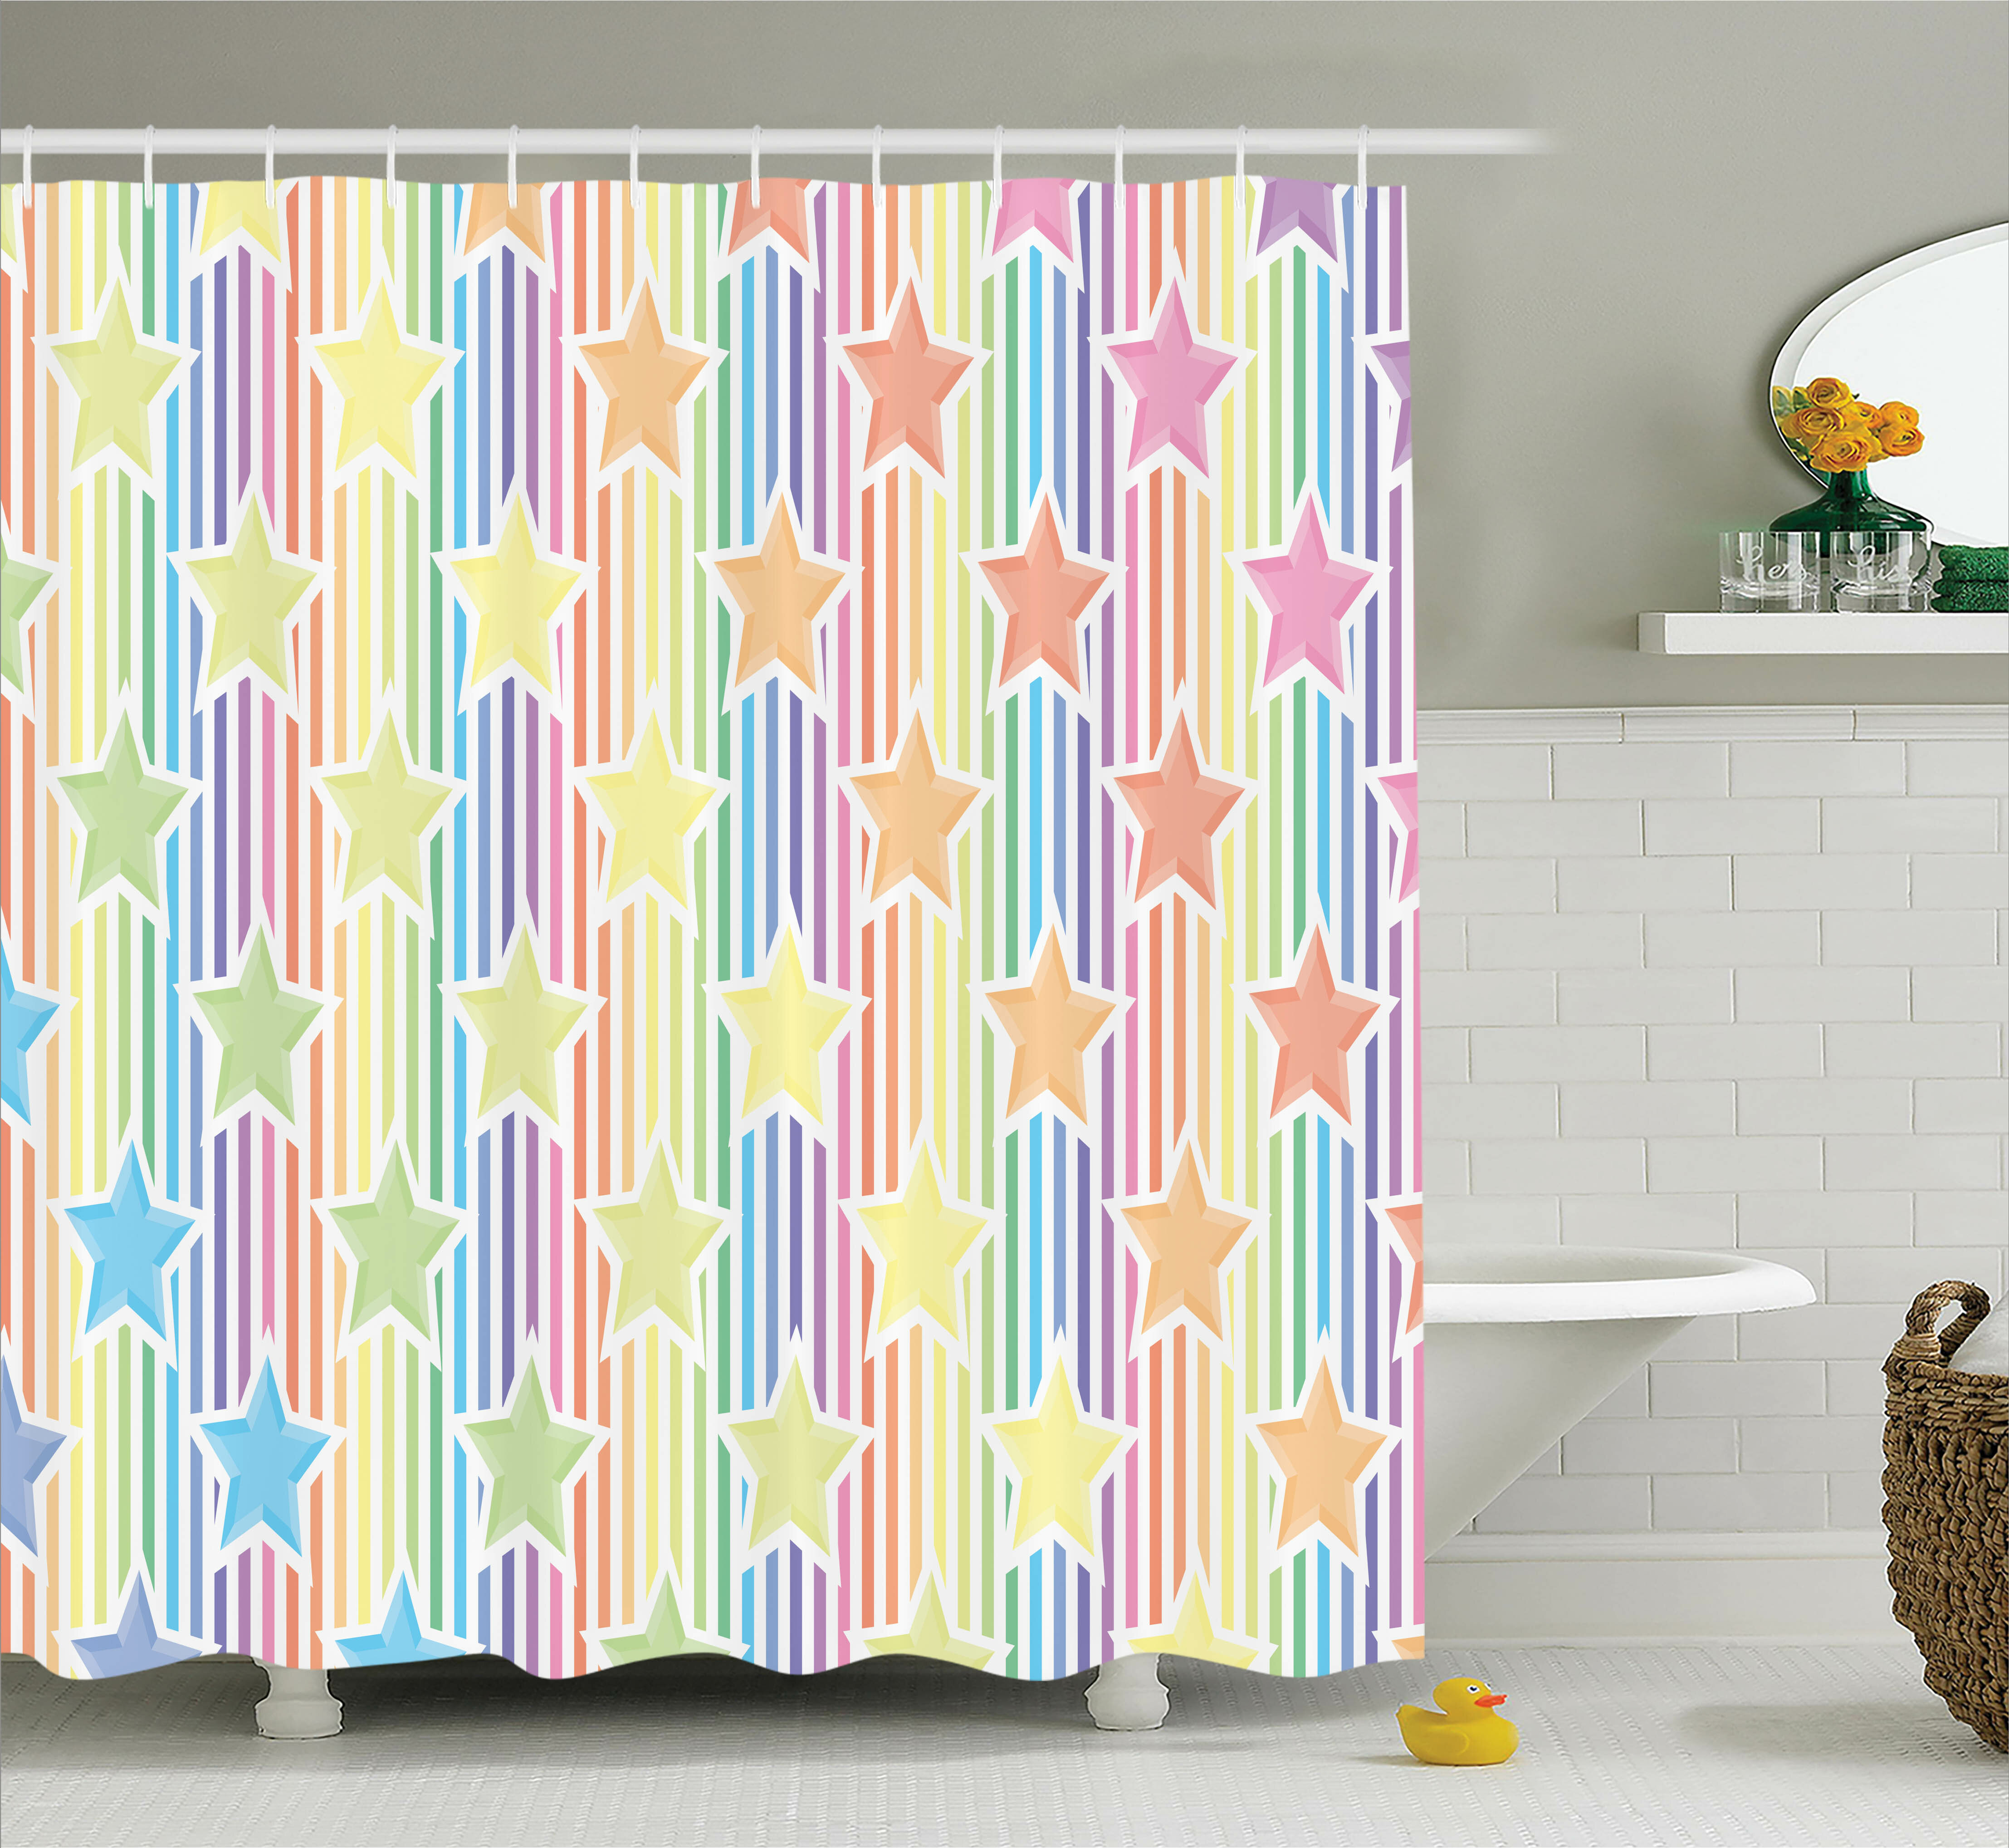 Terrific Brenda Rainbow Stars On Colorful Striped Fun Art Abstract Teen Room Playroom Concept Single Shower Curtain Download Free Architecture Designs Ogrambritishbridgeorg